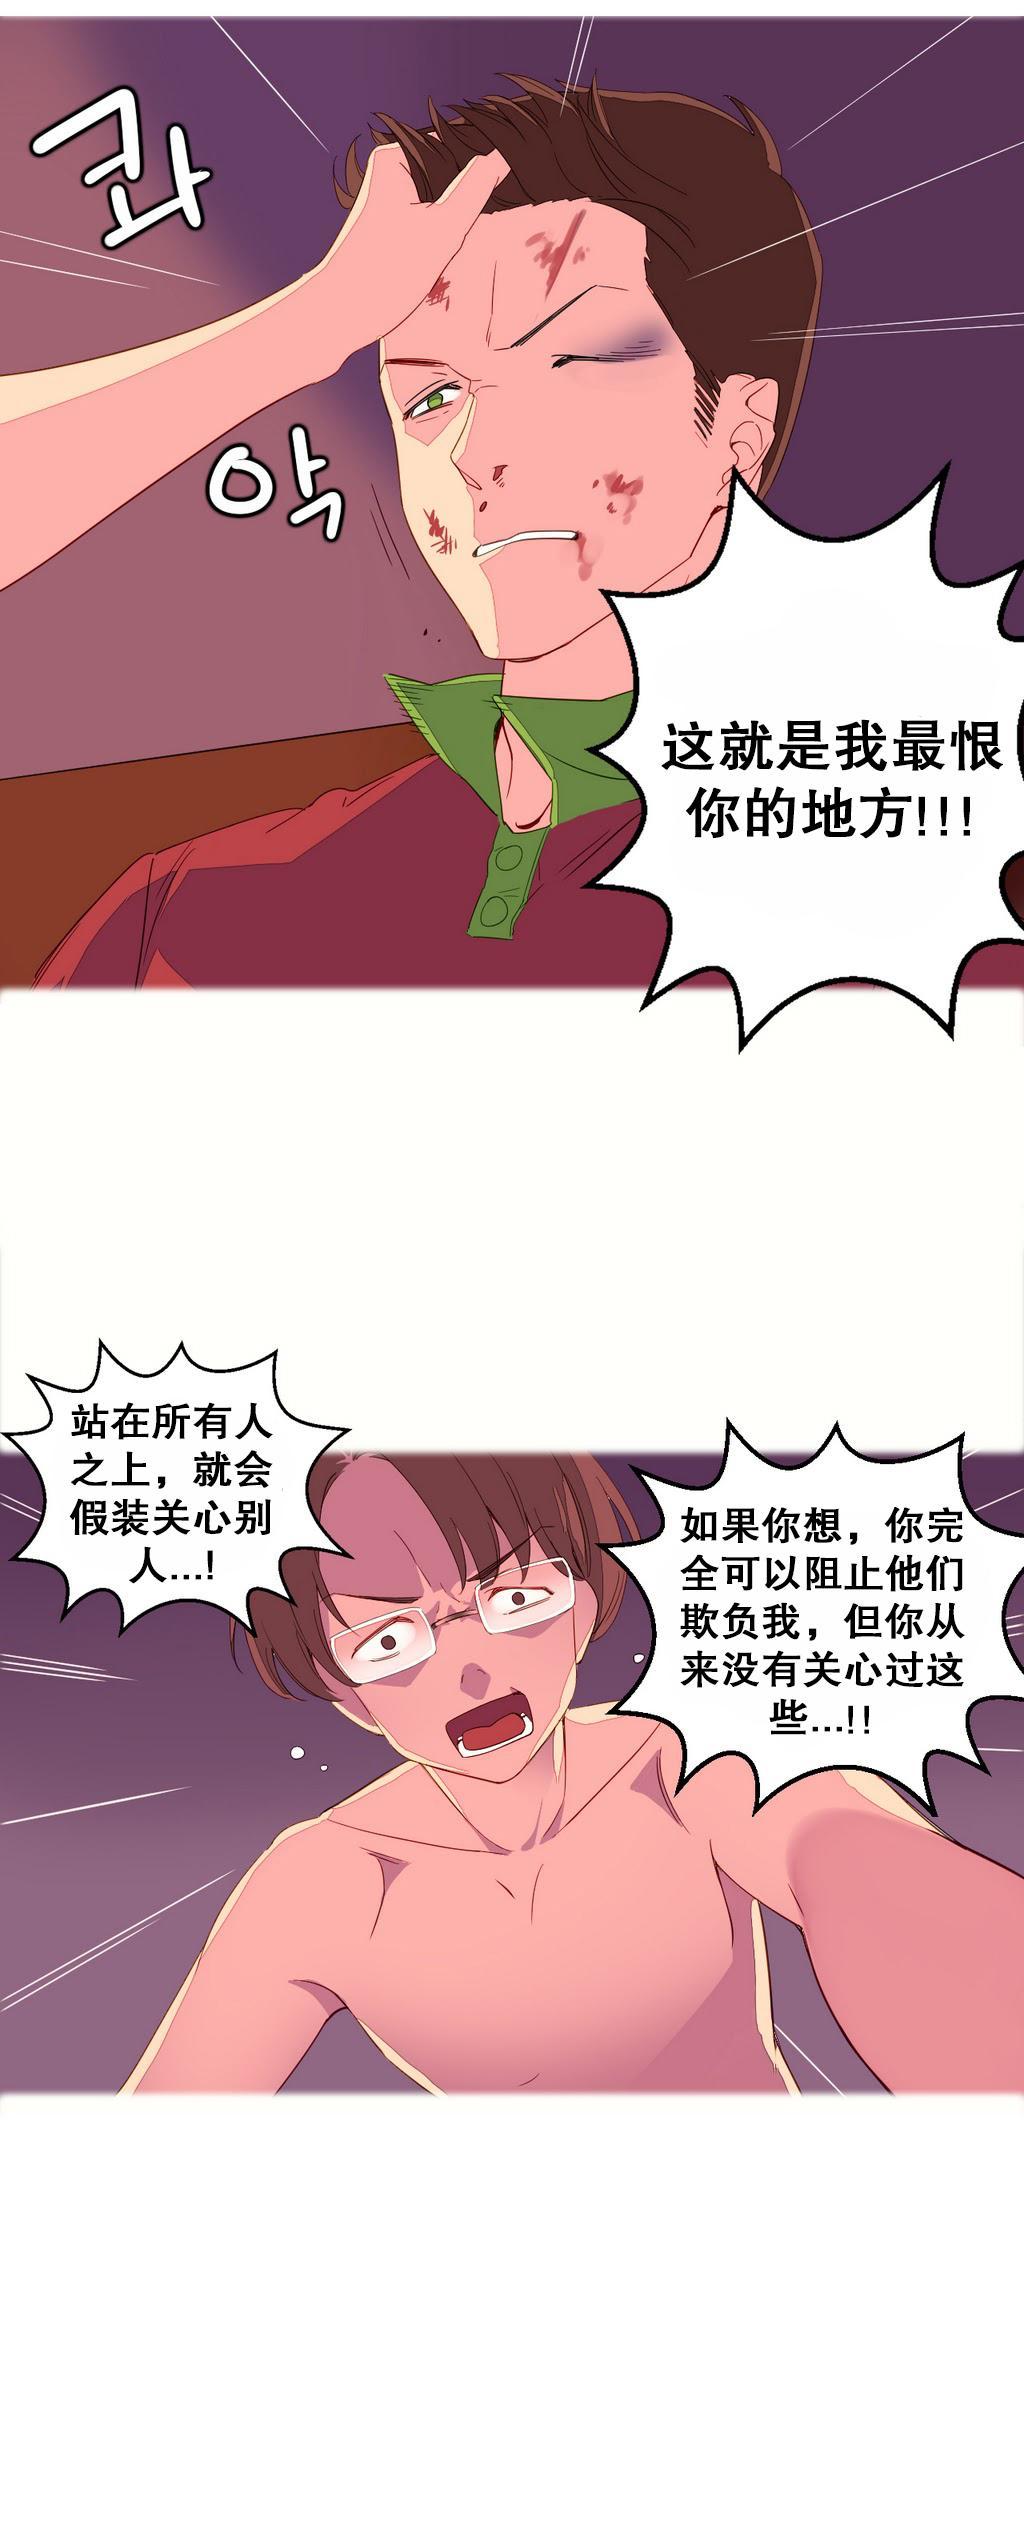 [Rozer] 一个由我统治的世界(A World that I Rule) Ch.1-3 [Chinese] 30